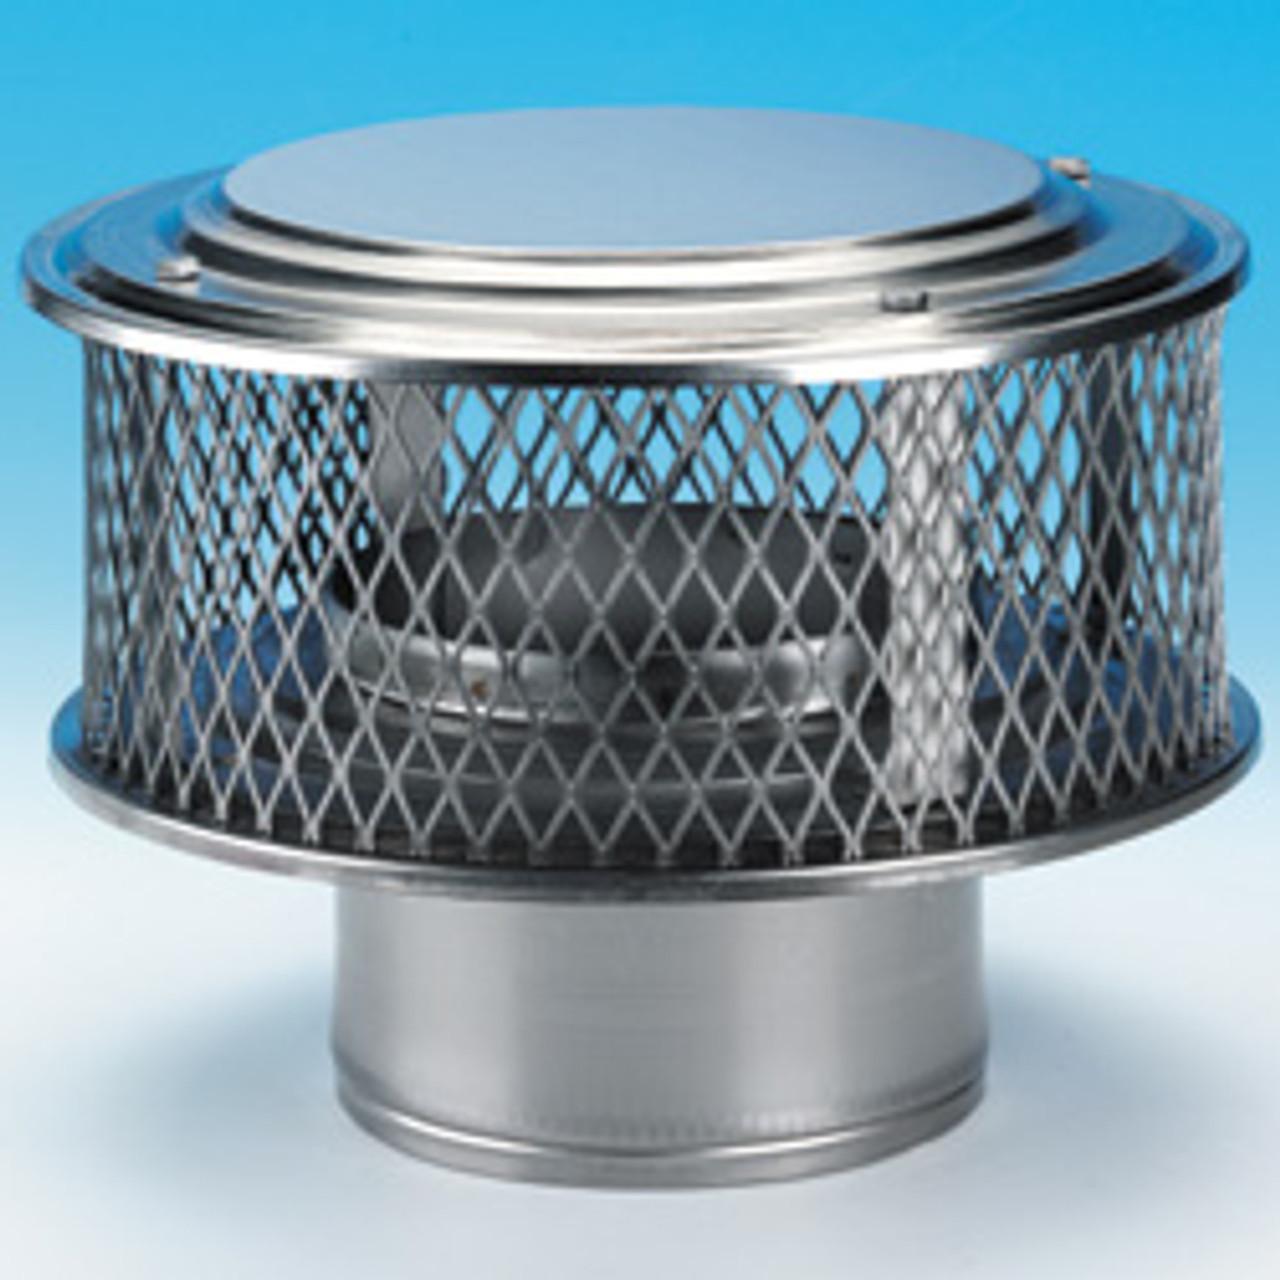 Round chimney cap